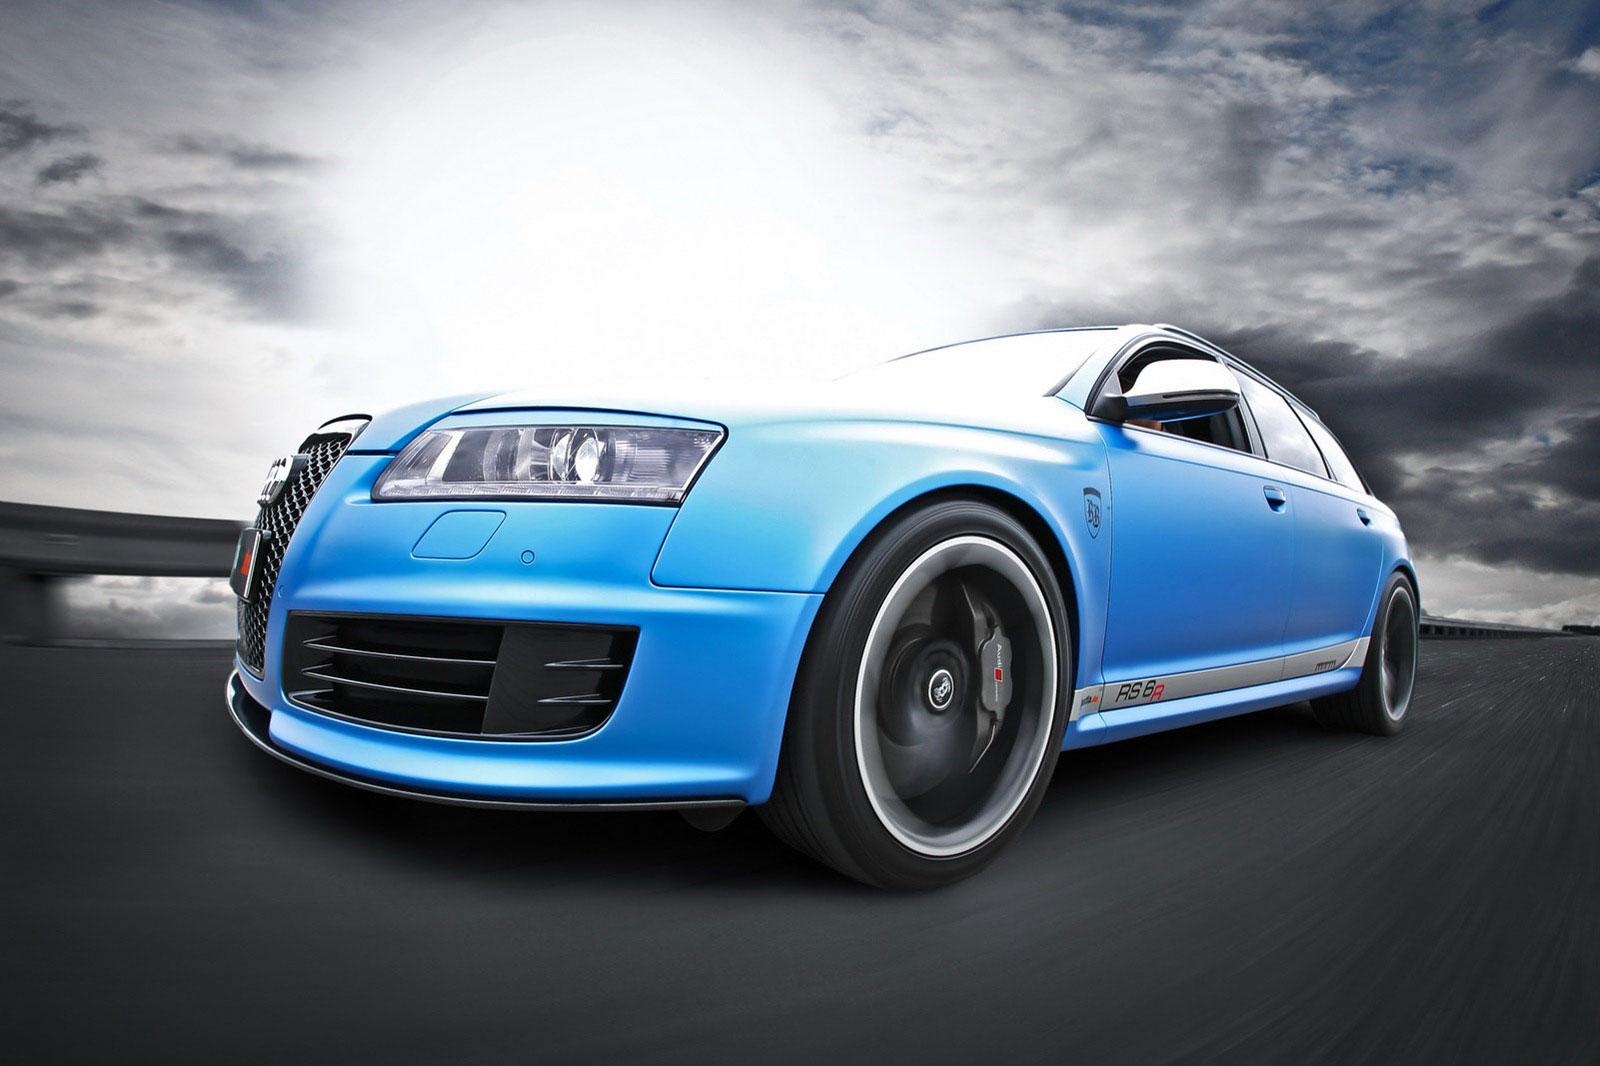 Fostla a MTM vytvořili velmi našlapané Audi RS6 Avant 3